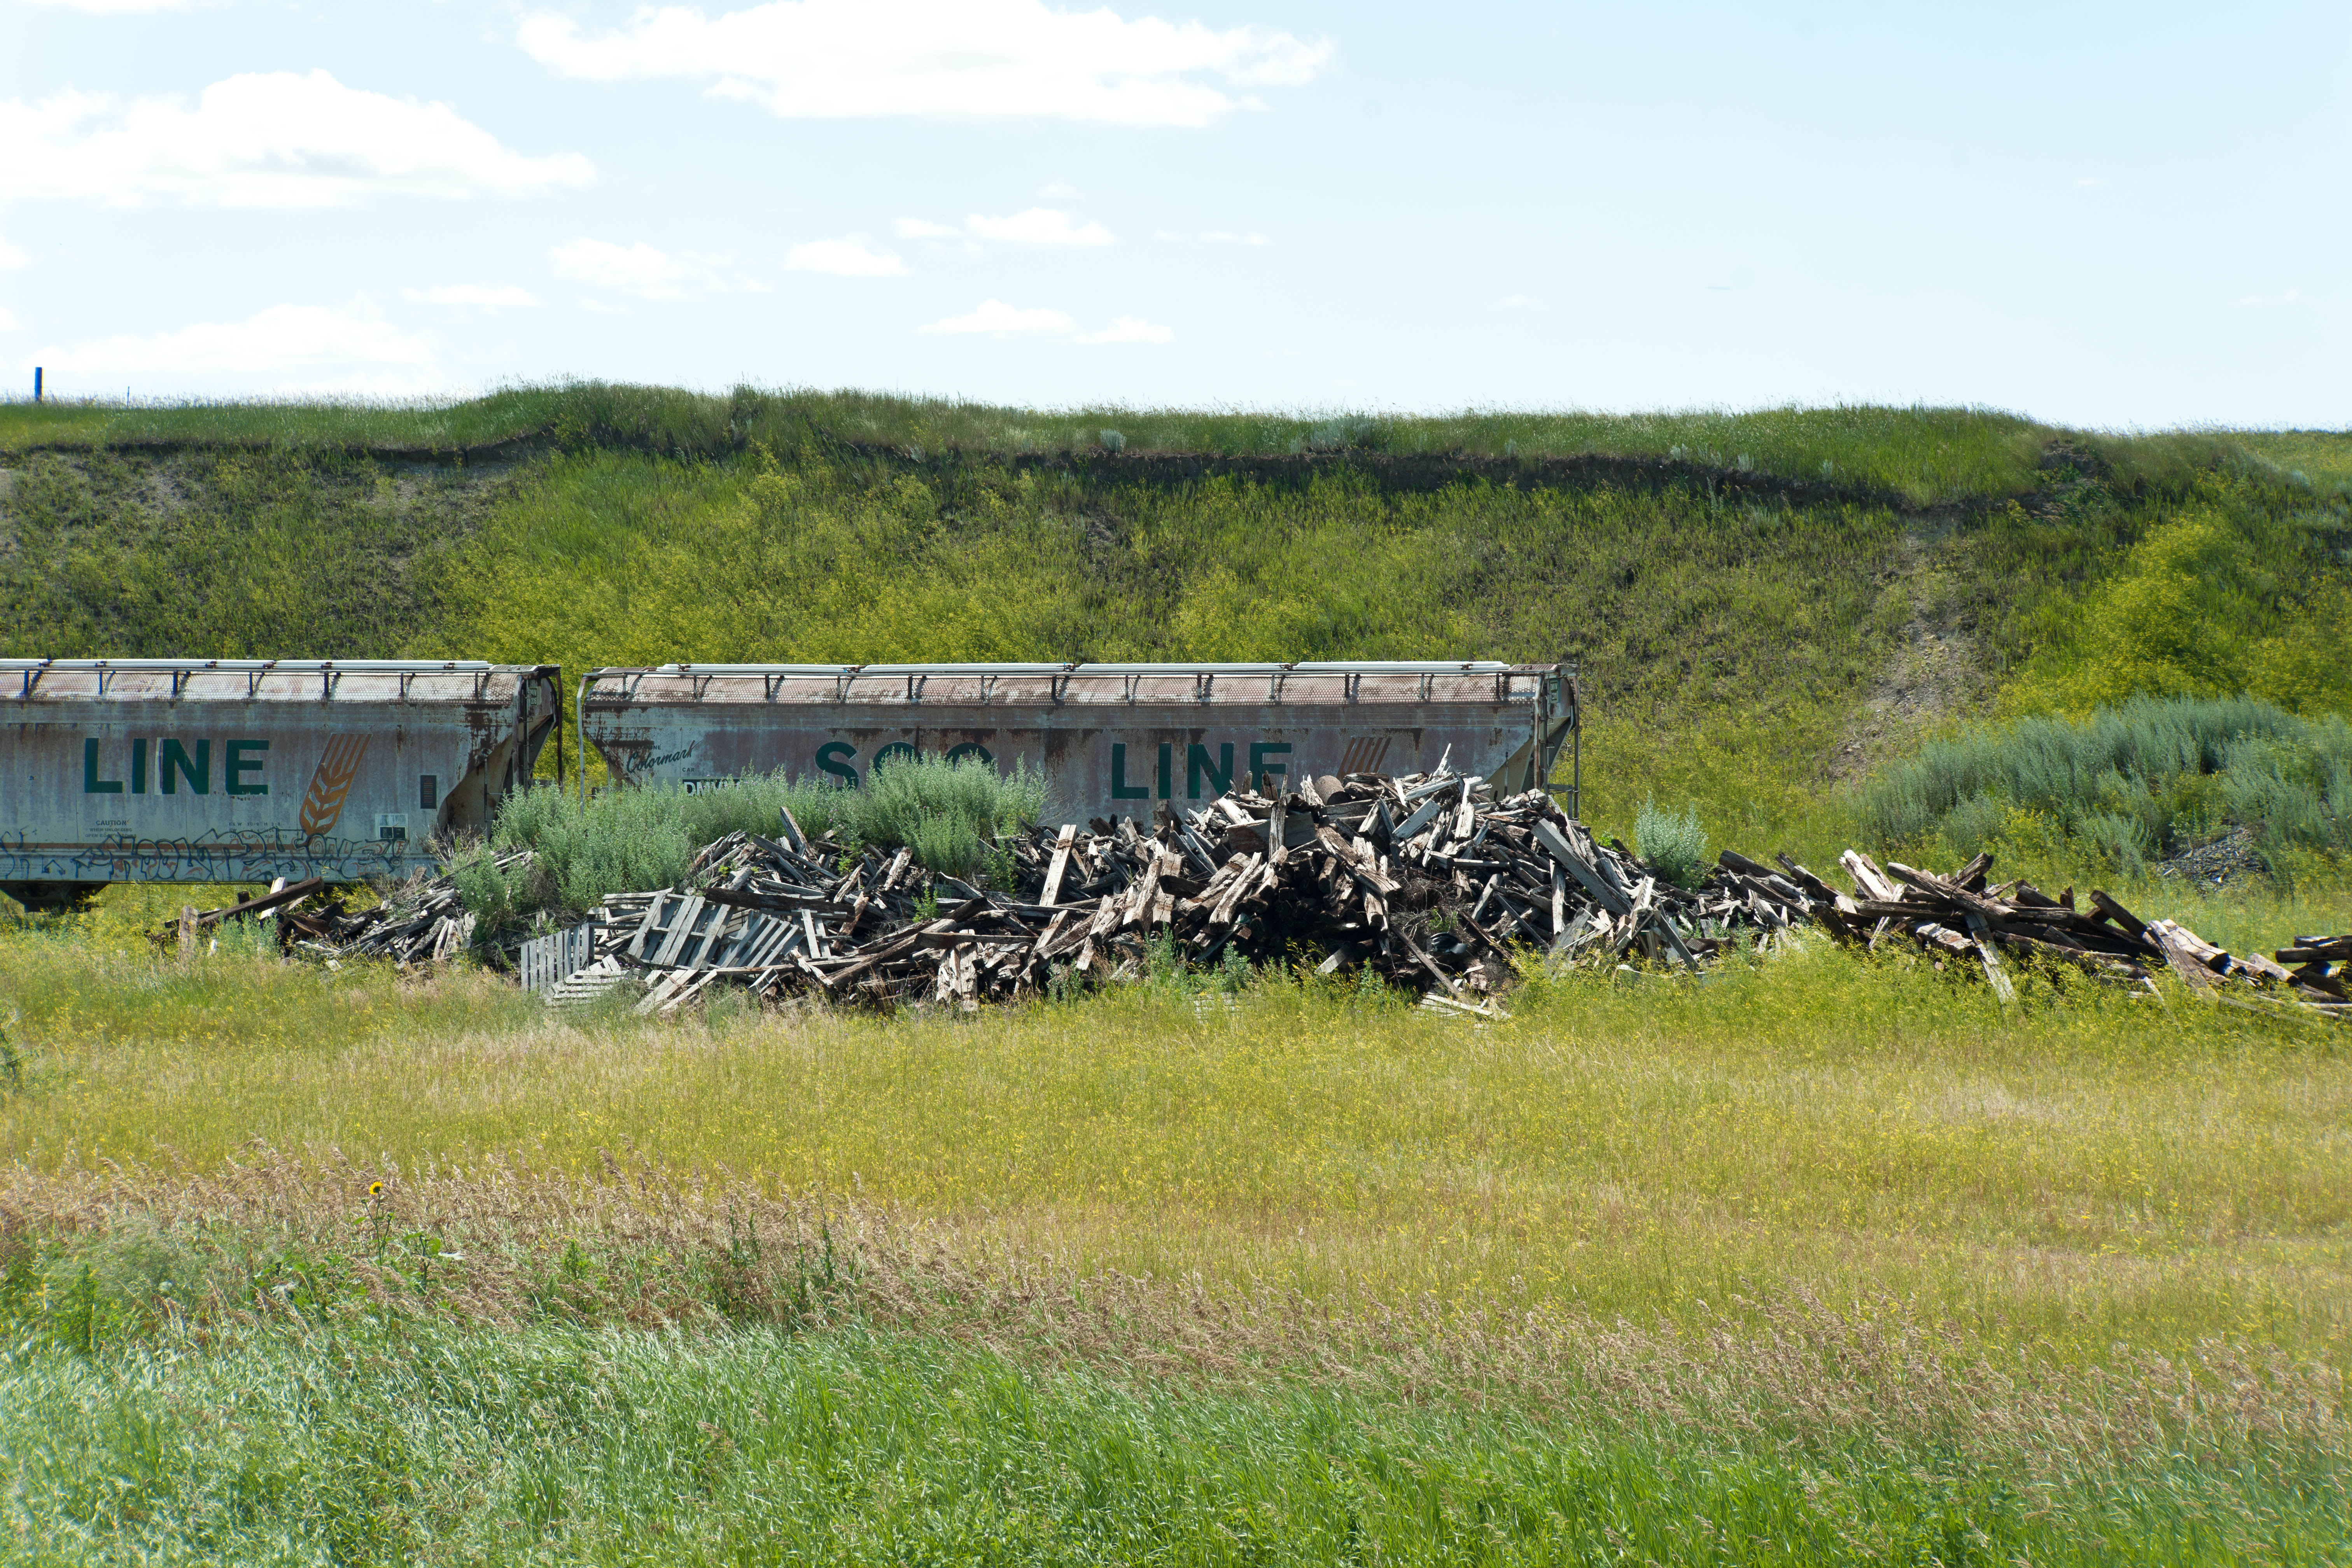 Singles in wilton north dakota Wind farm, The Dickinson Press